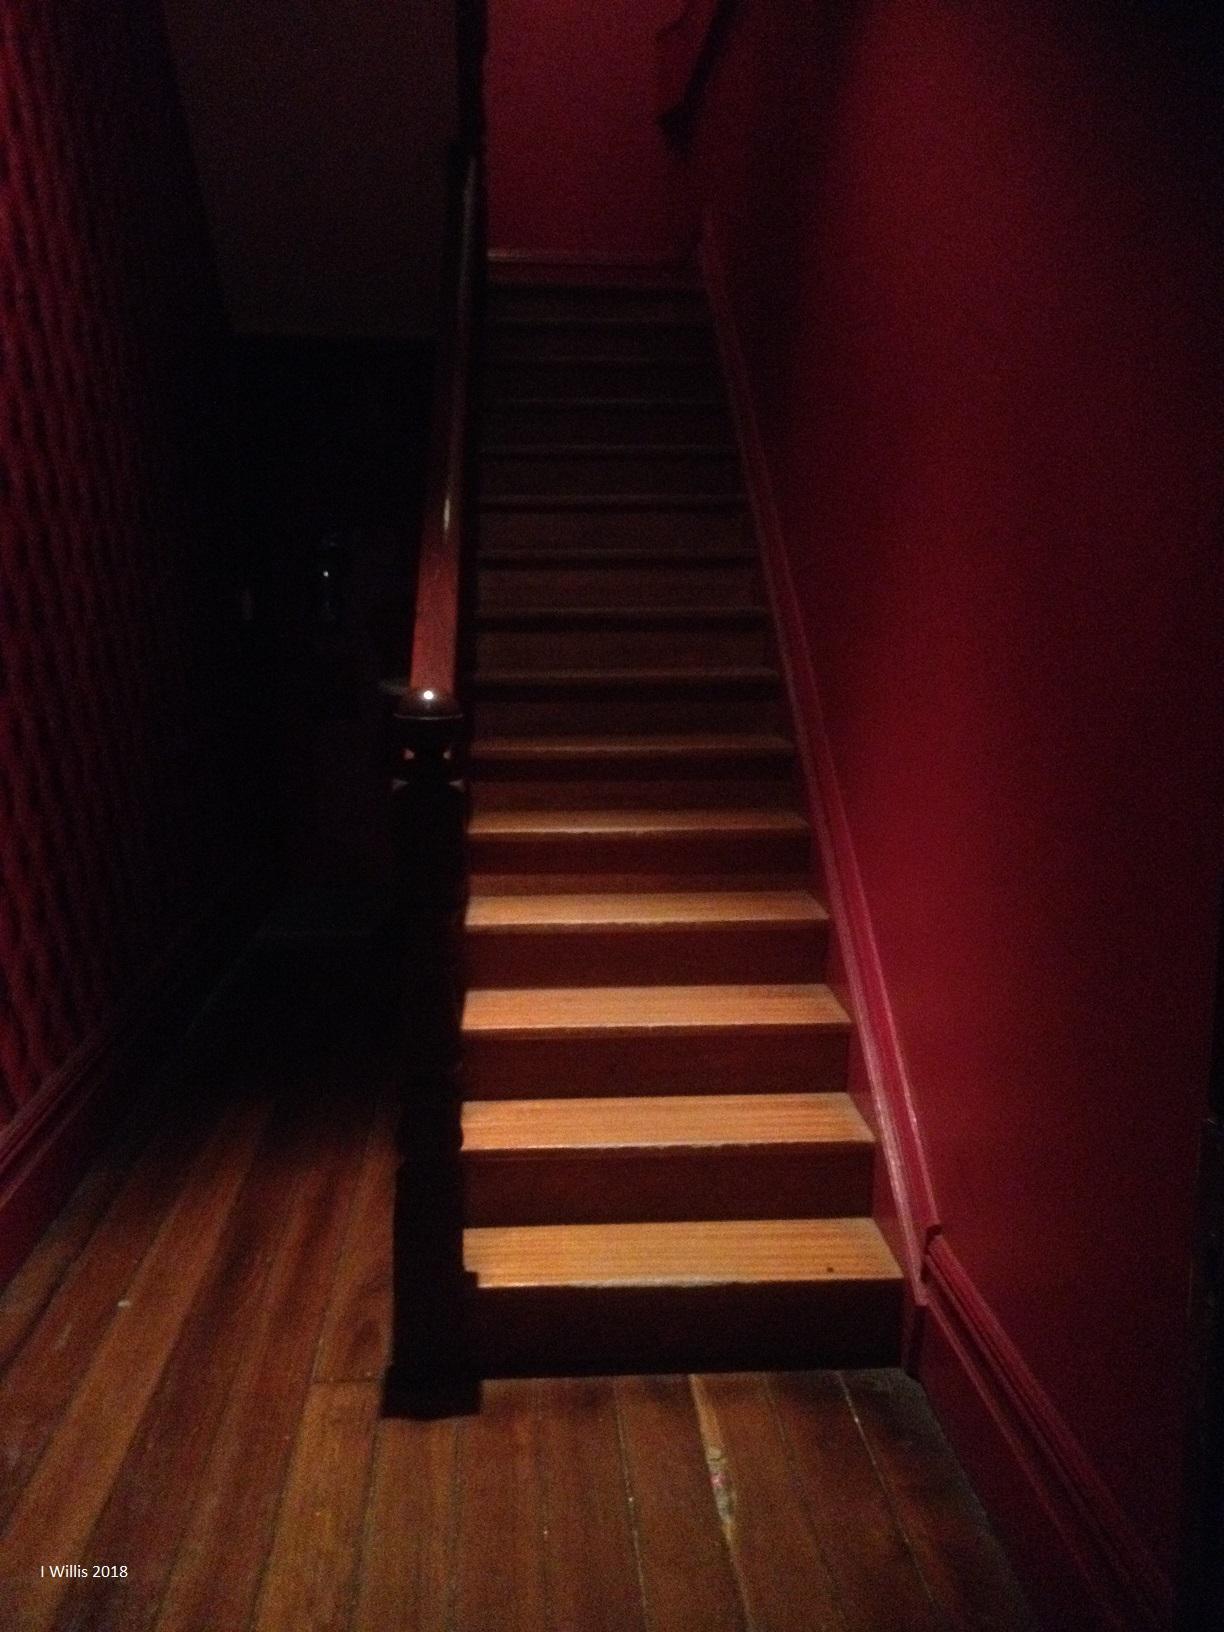 Camden Whitemans Going Upstairs (at Freds) 2018 IWillis